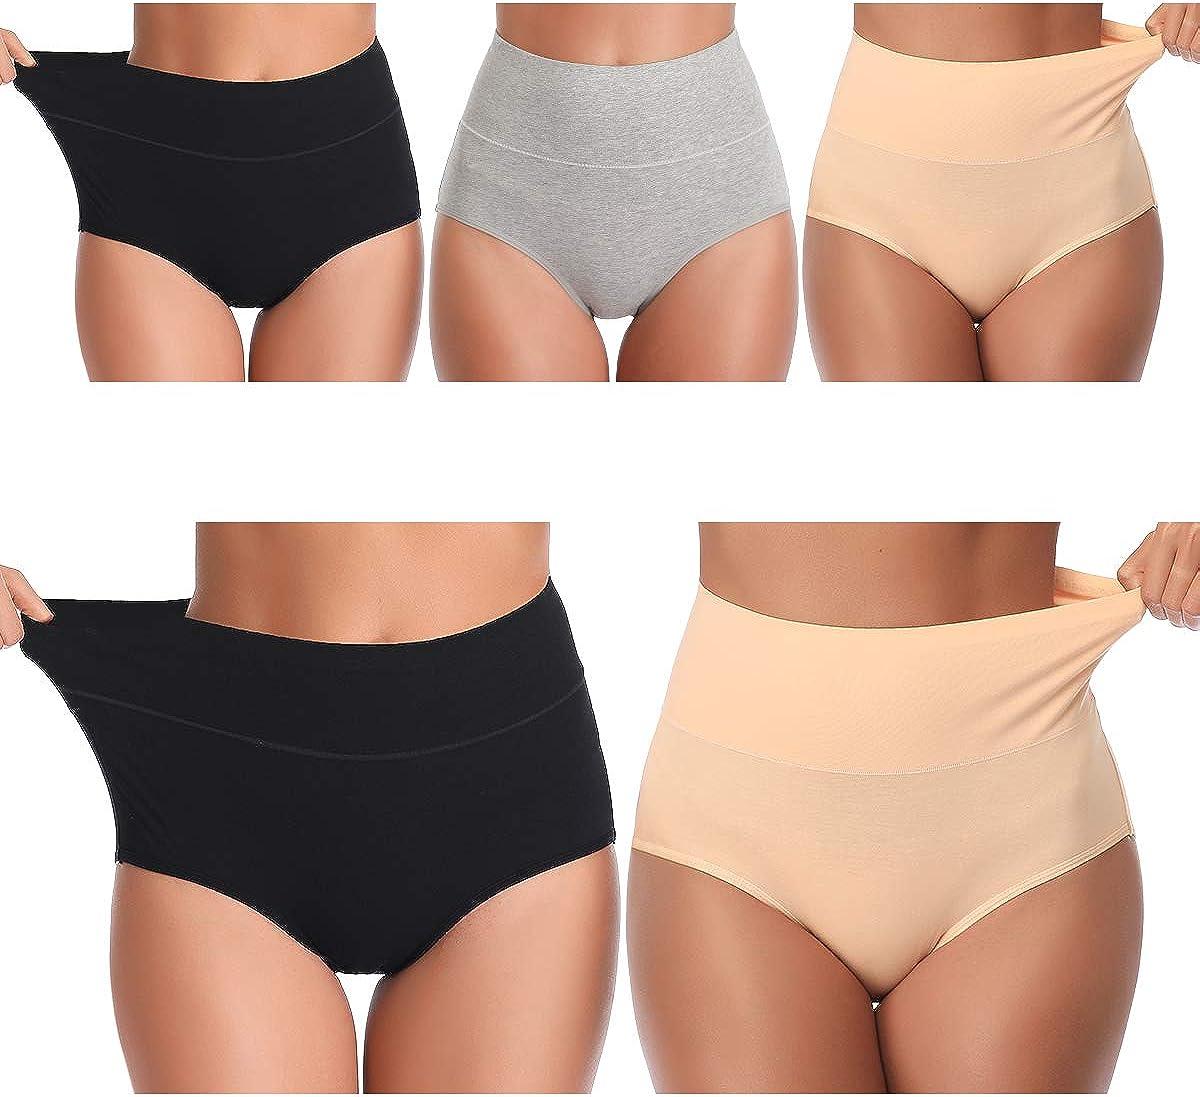 UMMISS Womens Underwear,Cotton High Waist Underwear for Women Full Coverage Soft Comfortable Briefs Panty Multipack